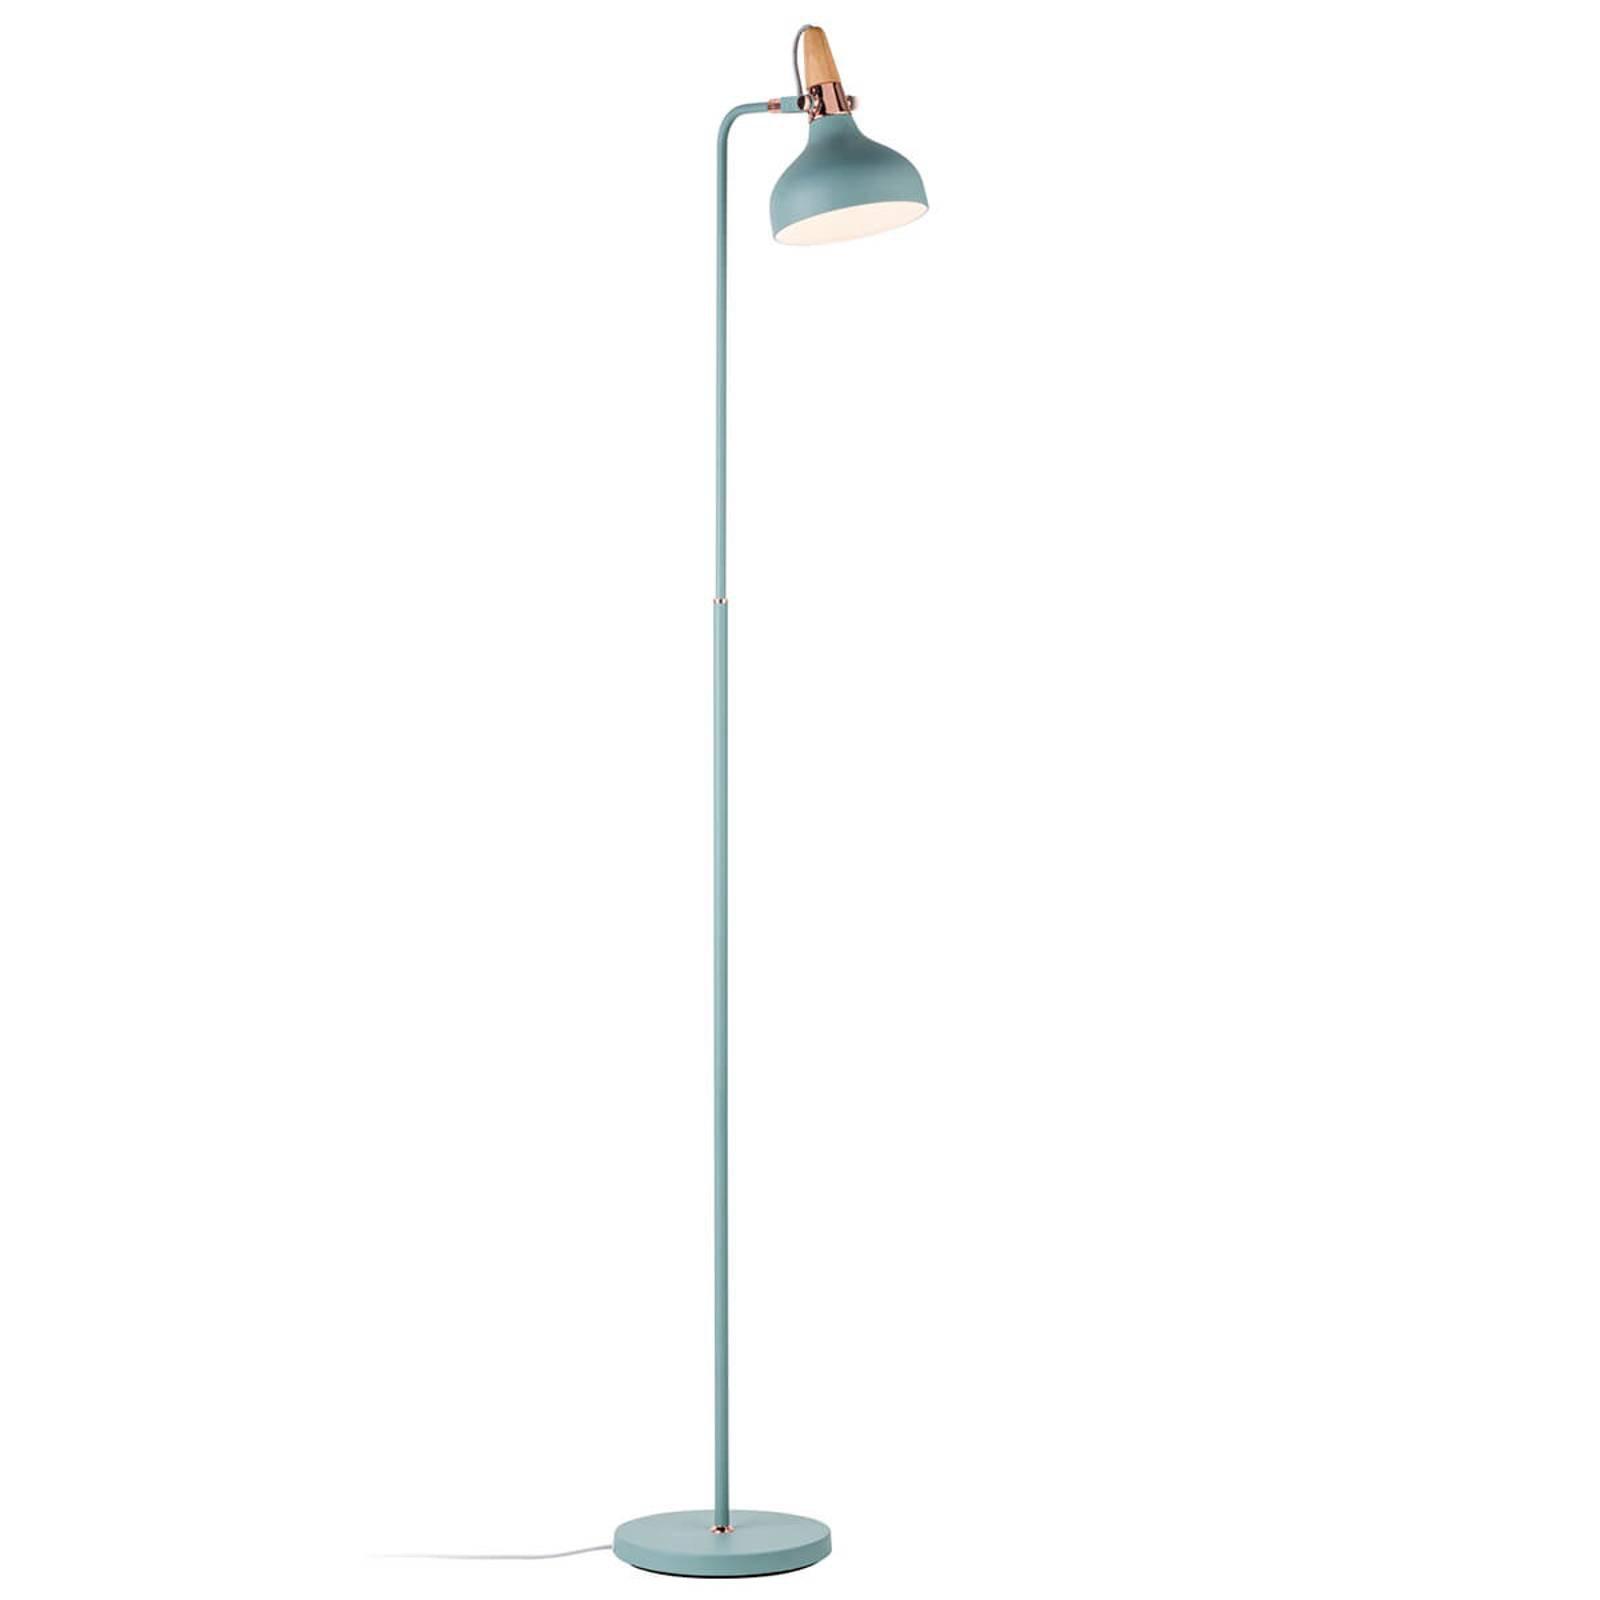 Paulmann Juna gulvlampe med pene detaljer